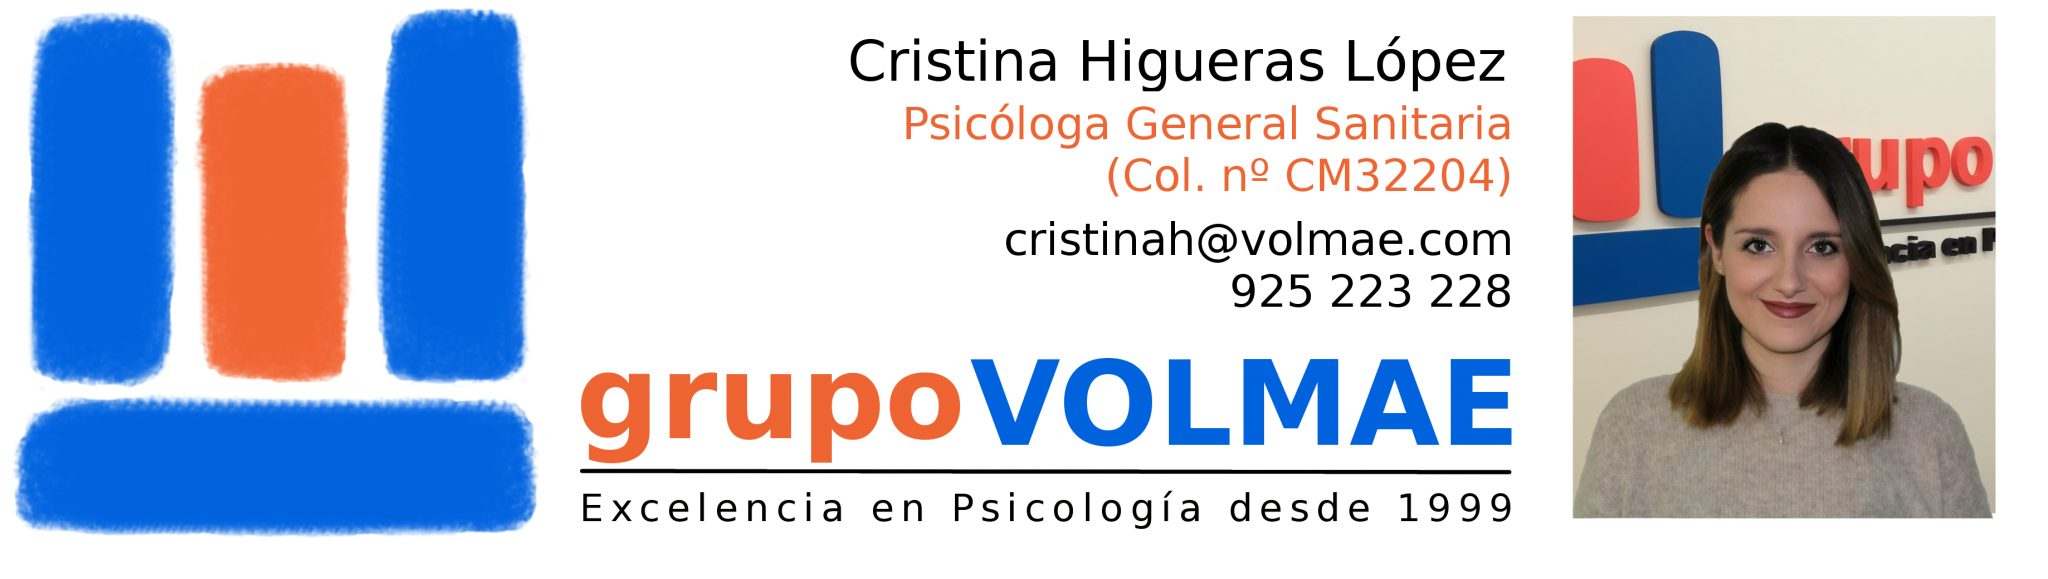 Cristina Higueras 3